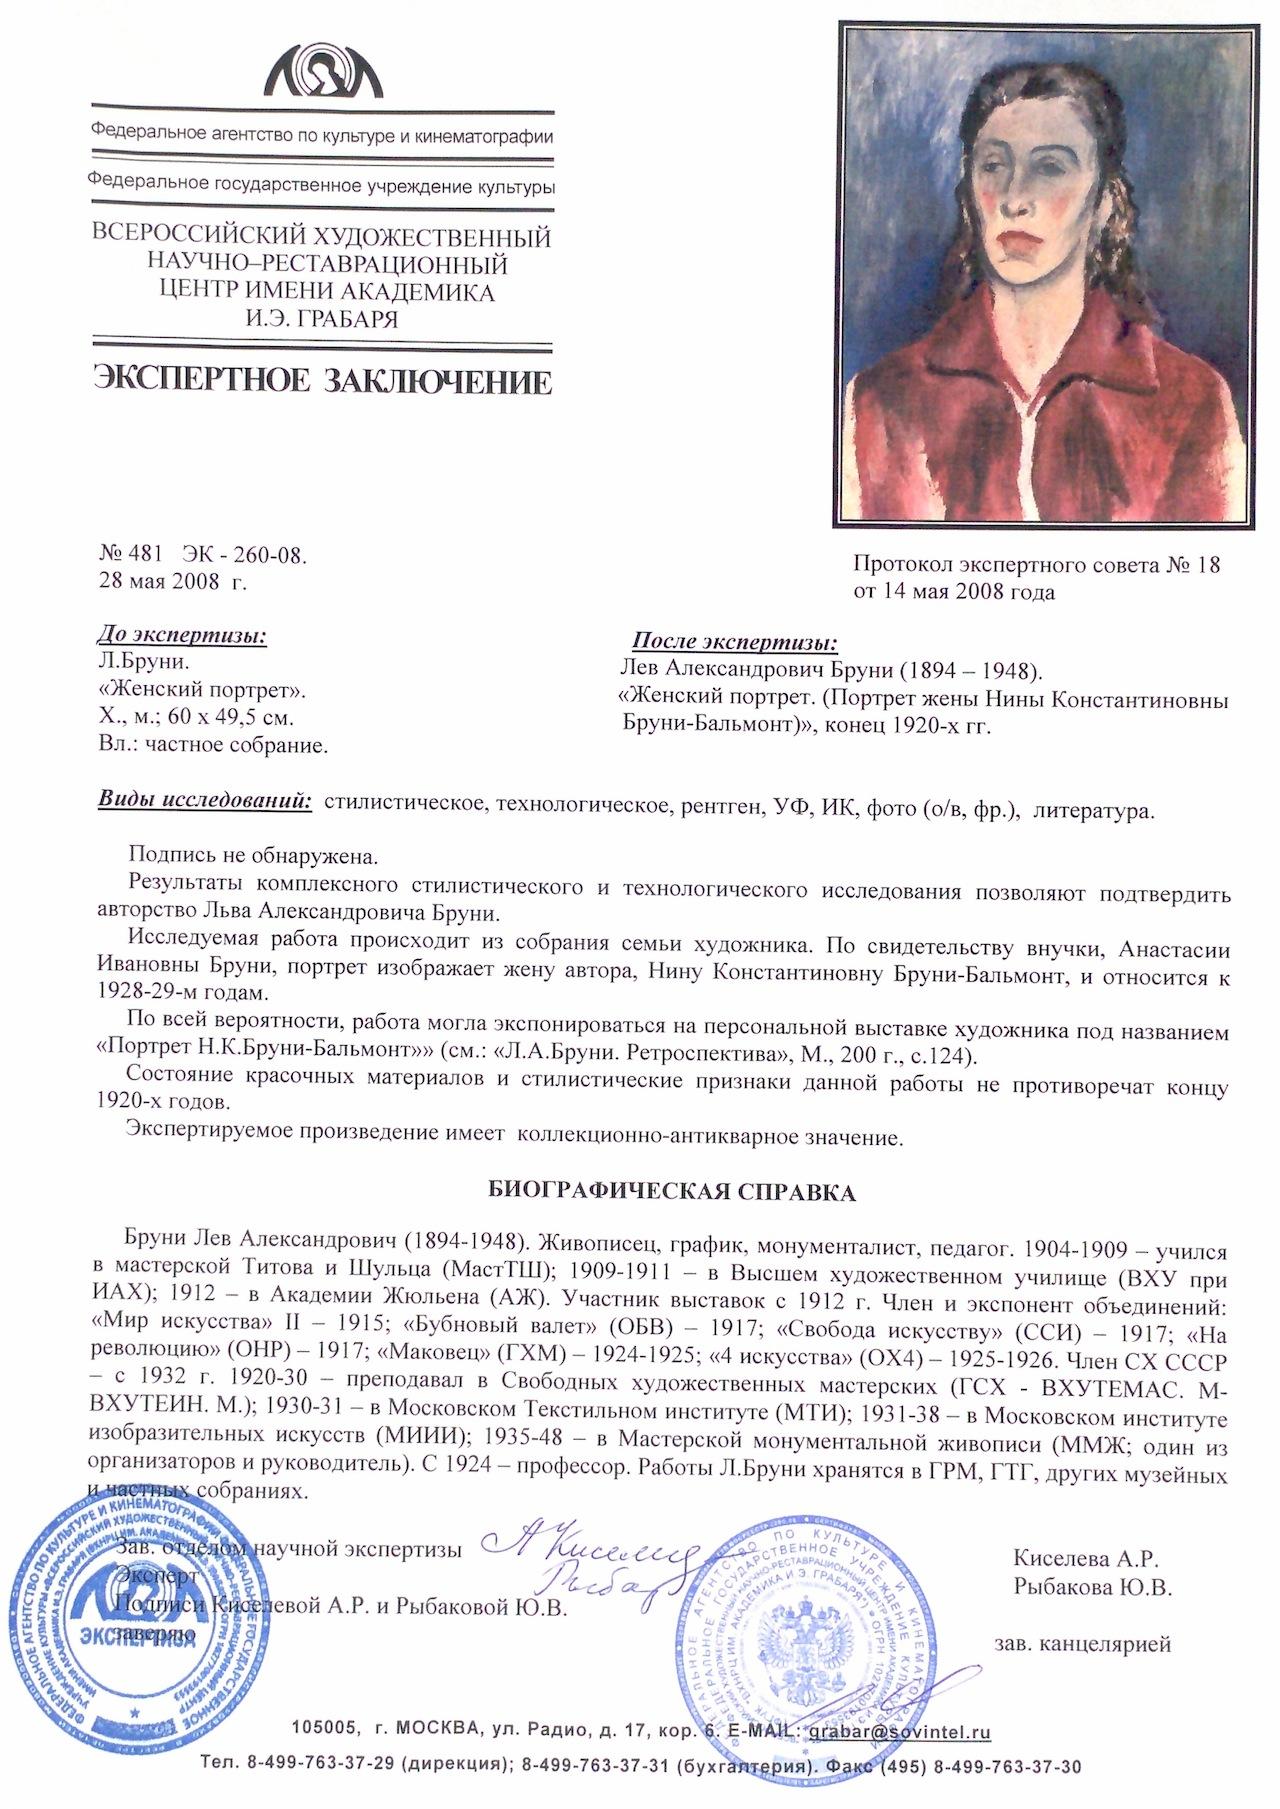 Эксперт. Бруни Лев Александрович. Портрет Н. К. Бруни-Бальмонт